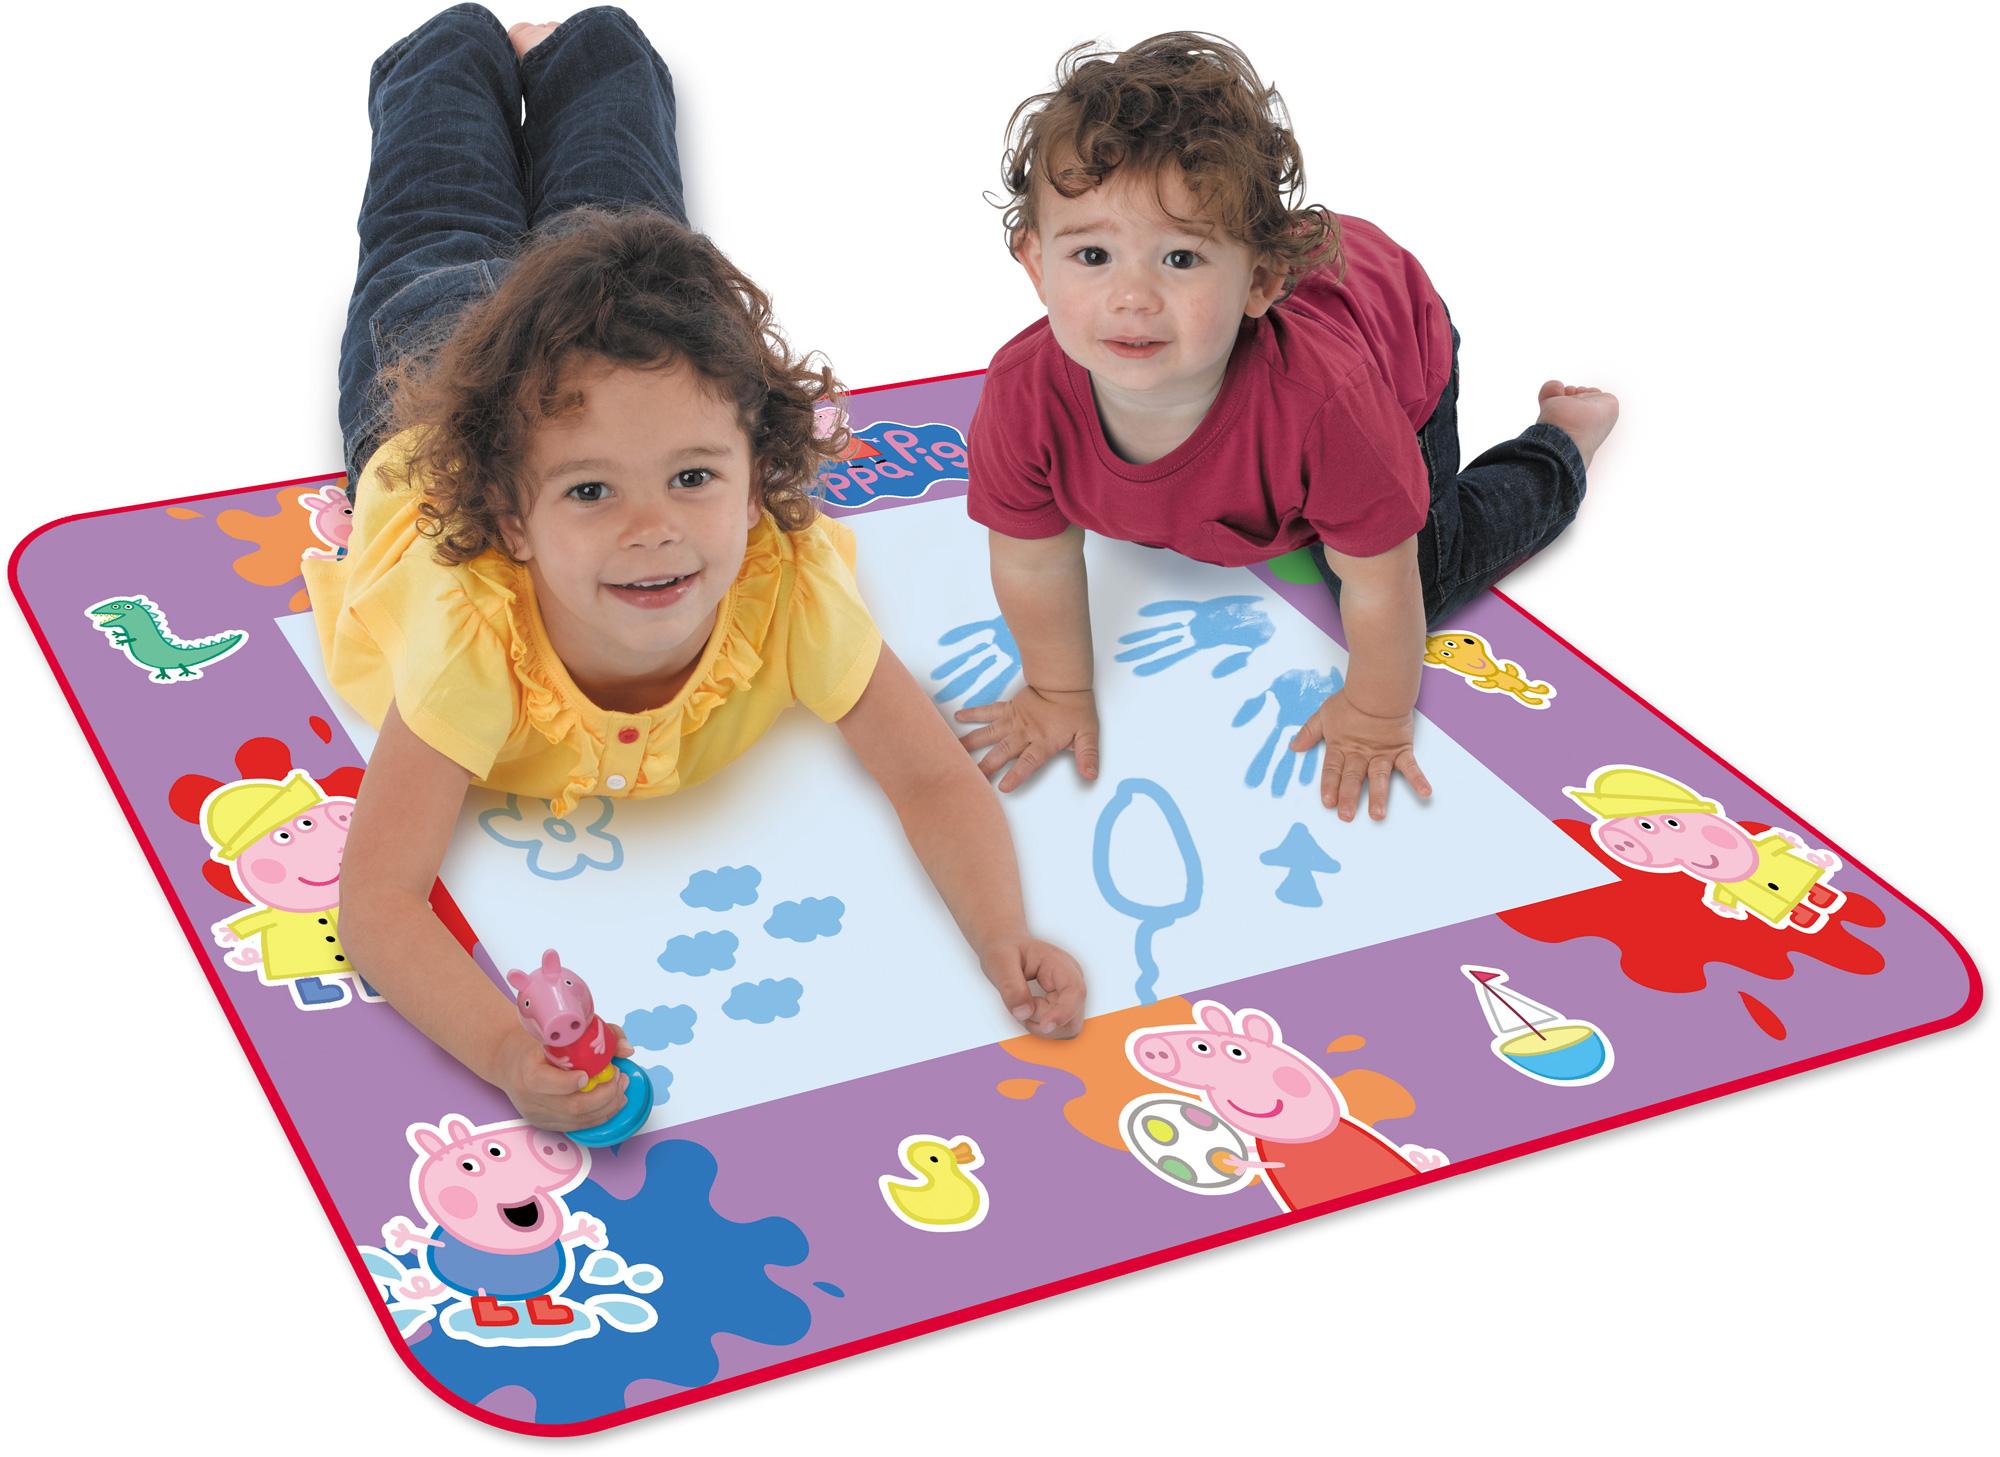 itm Tomy AQUADOODLE PEPPA PIG SET No Mess Drawing Art Craft Mat Toddler Child Toy